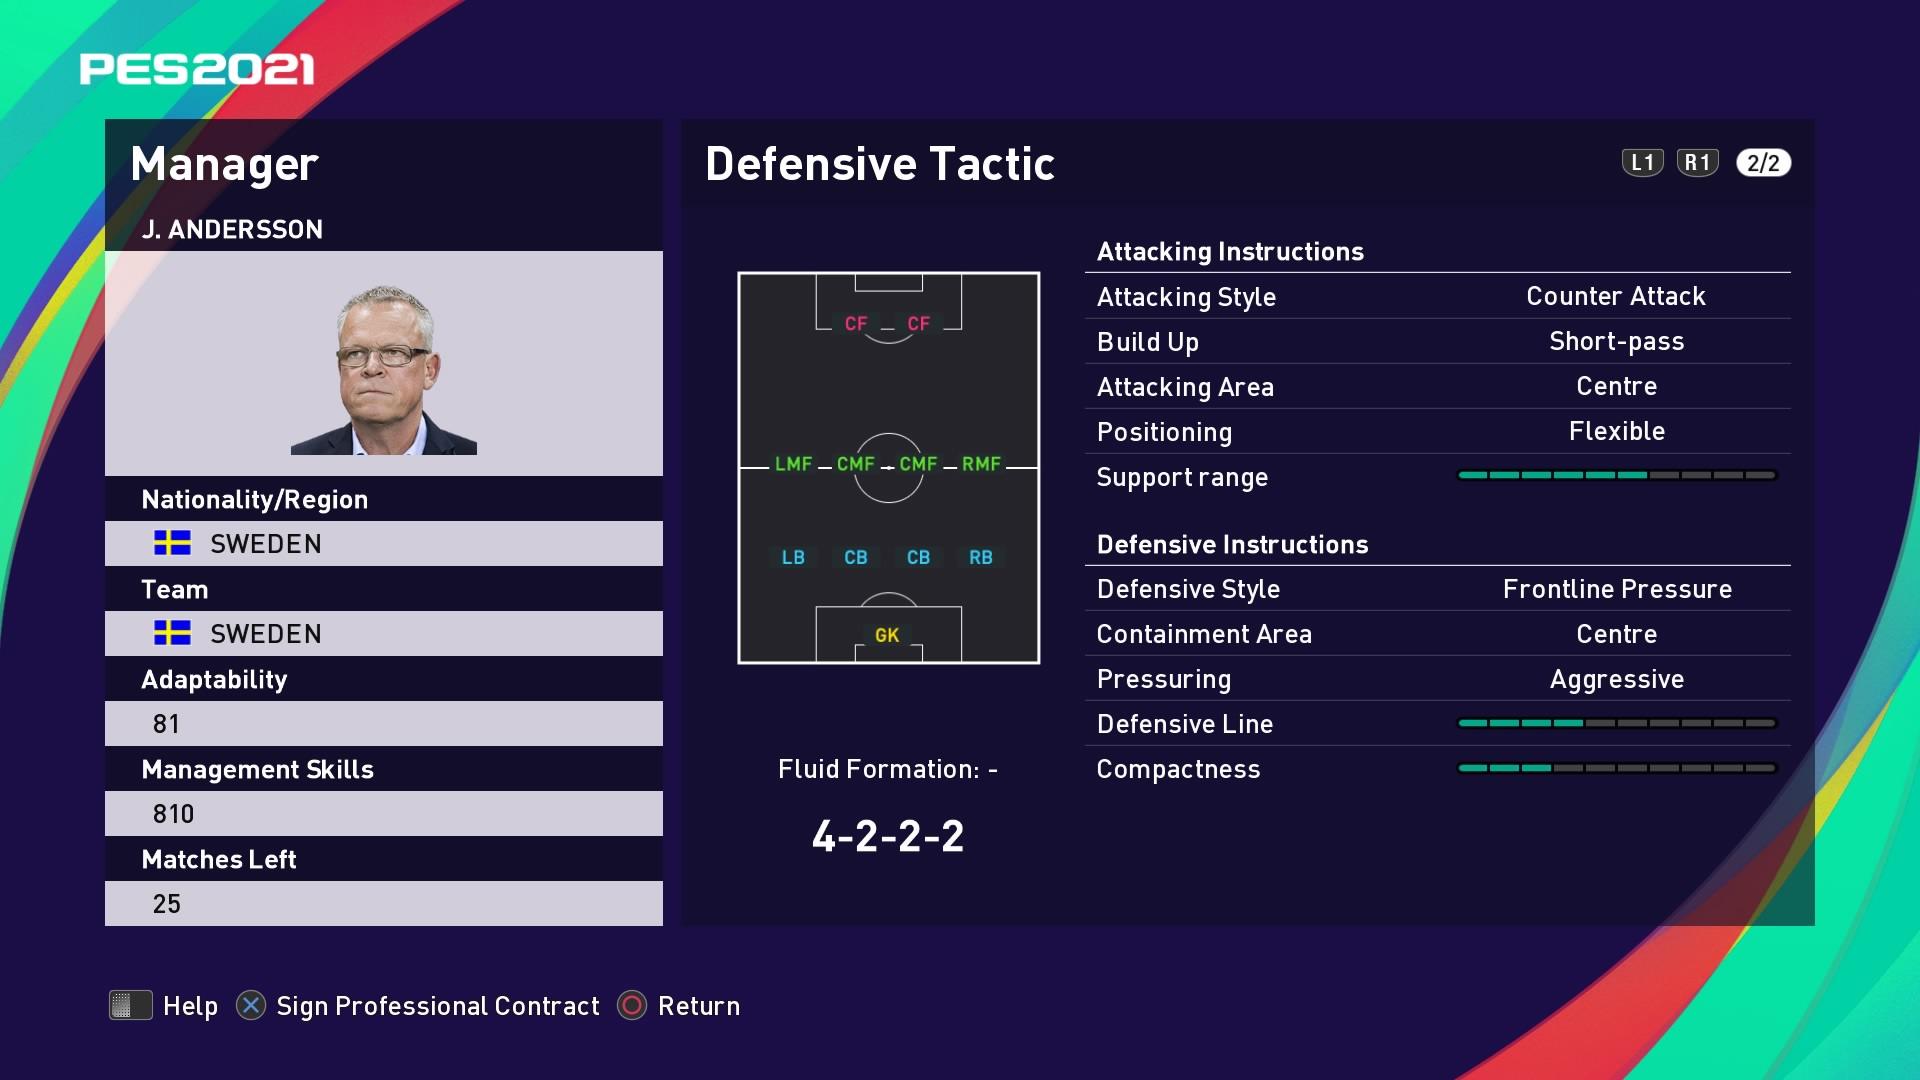 J. Andersson (Janne Andersson) Defensive Tactic in PES 2021 myClub